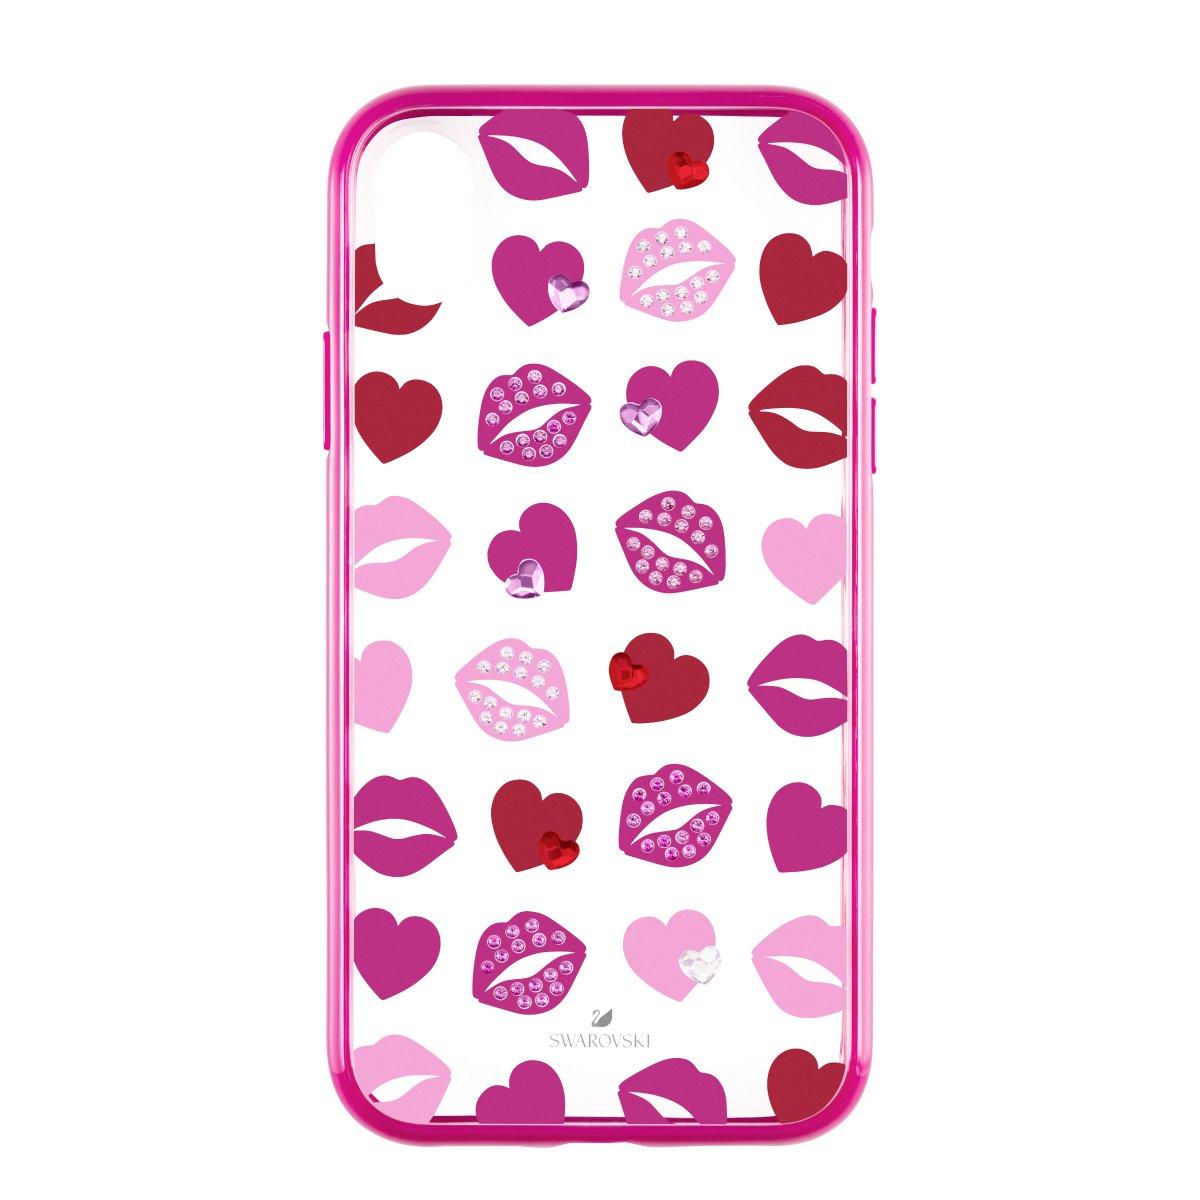 SWAROVSKI kryt na iPhone LOVELY IPXR:CASE PINK